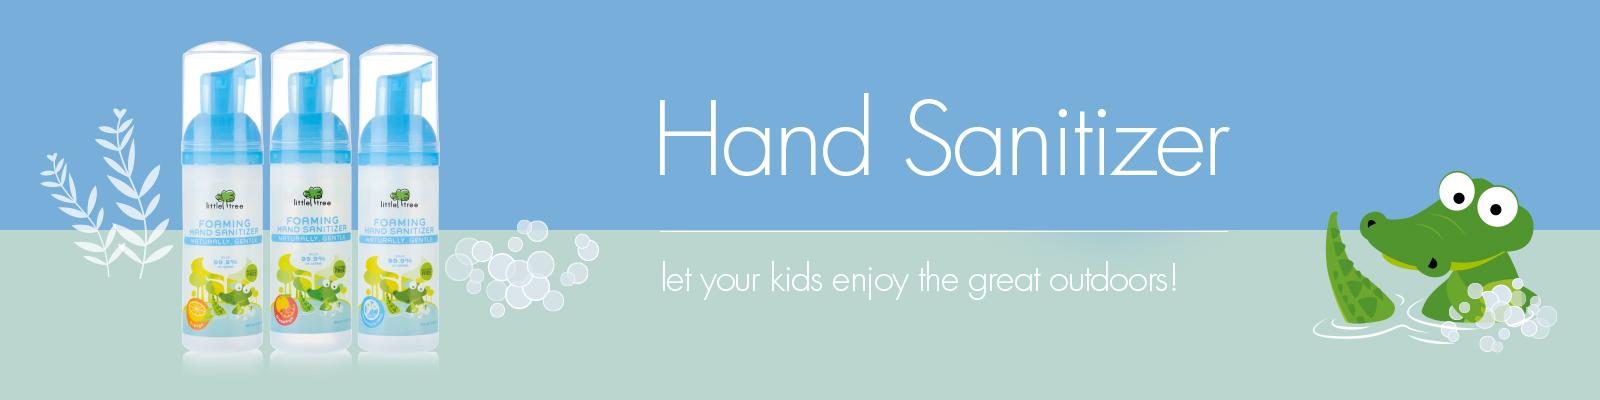 Desktop Banner for Beli Lotion Cuci Tangan Bayi / Hand Sanitizer Little Tree Termurah